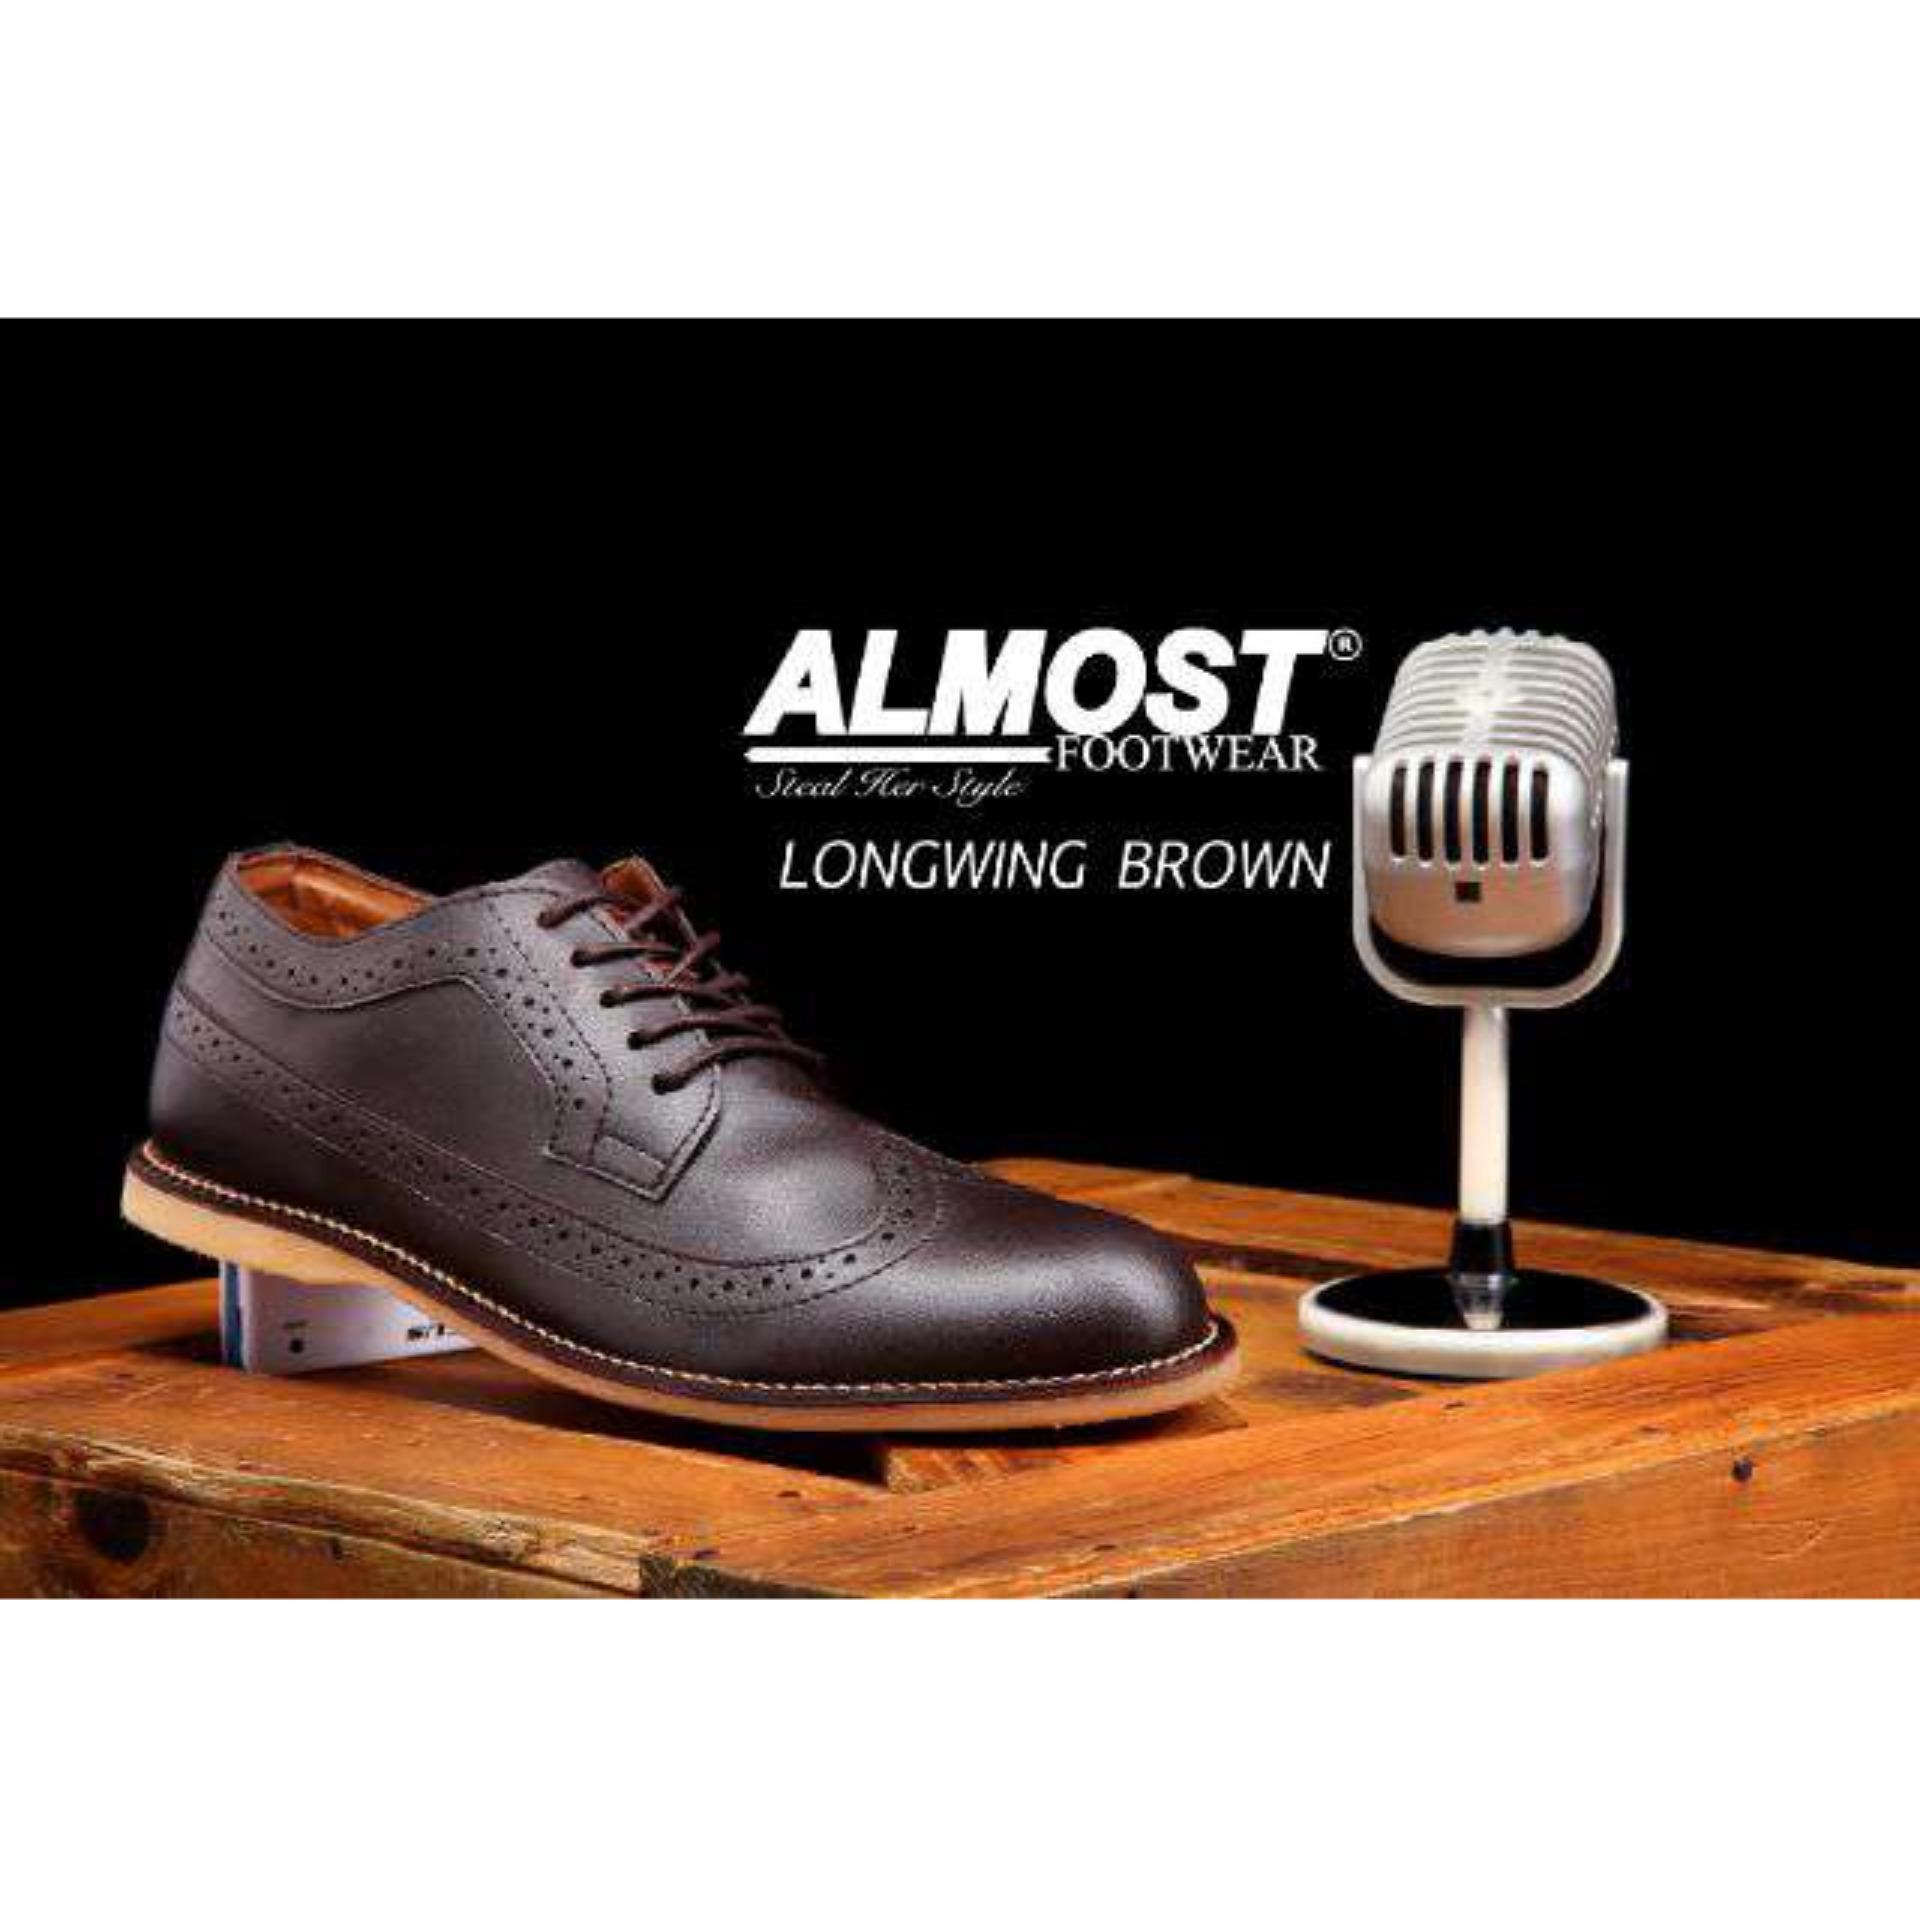 Flash Sale Sepatu Kasual Formal Pria Terbaru - ALMOST LONGWING - Brown